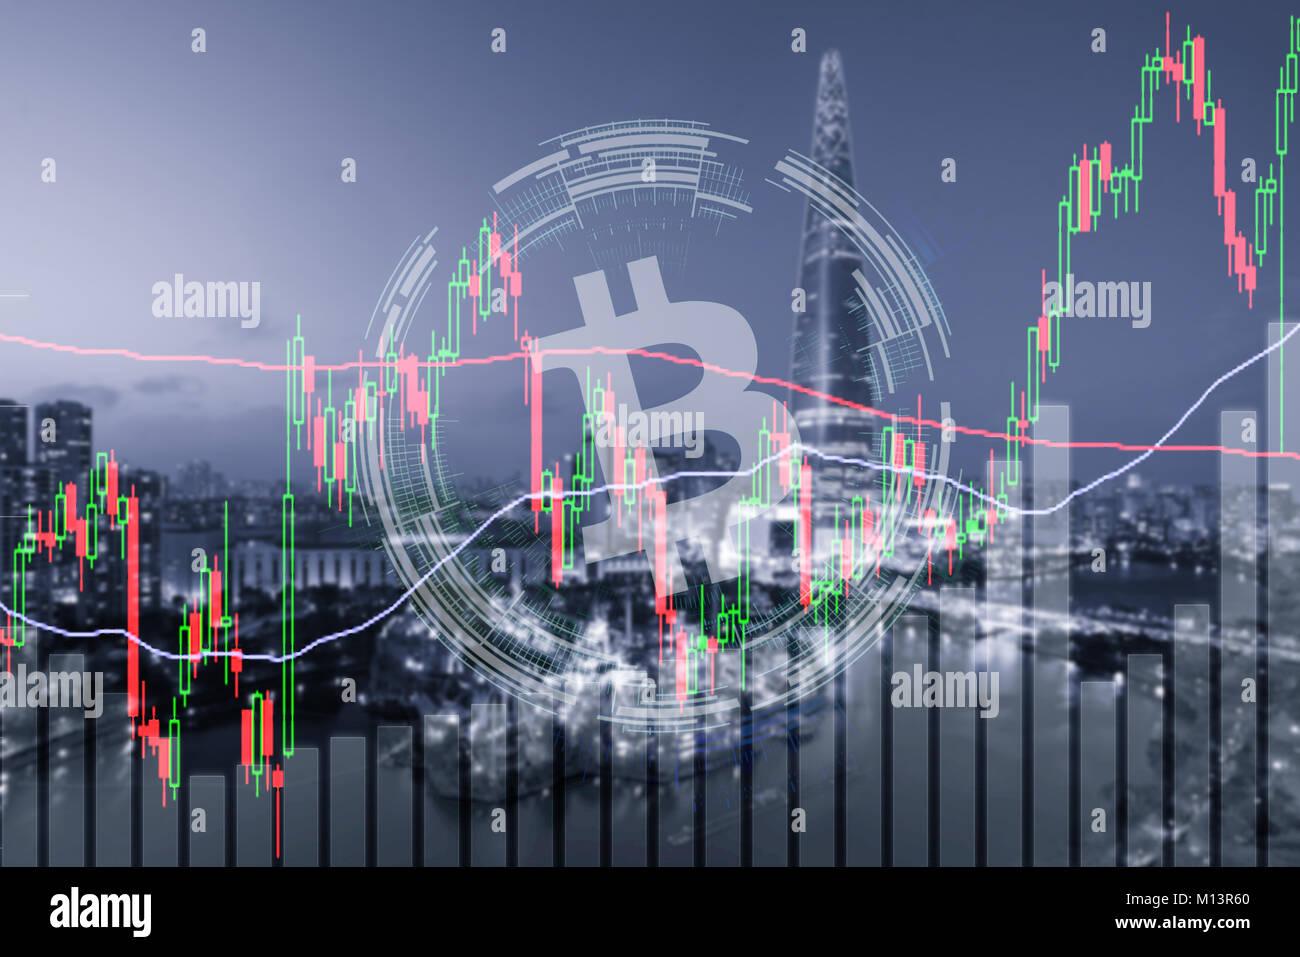 Trade bitcoin like forex